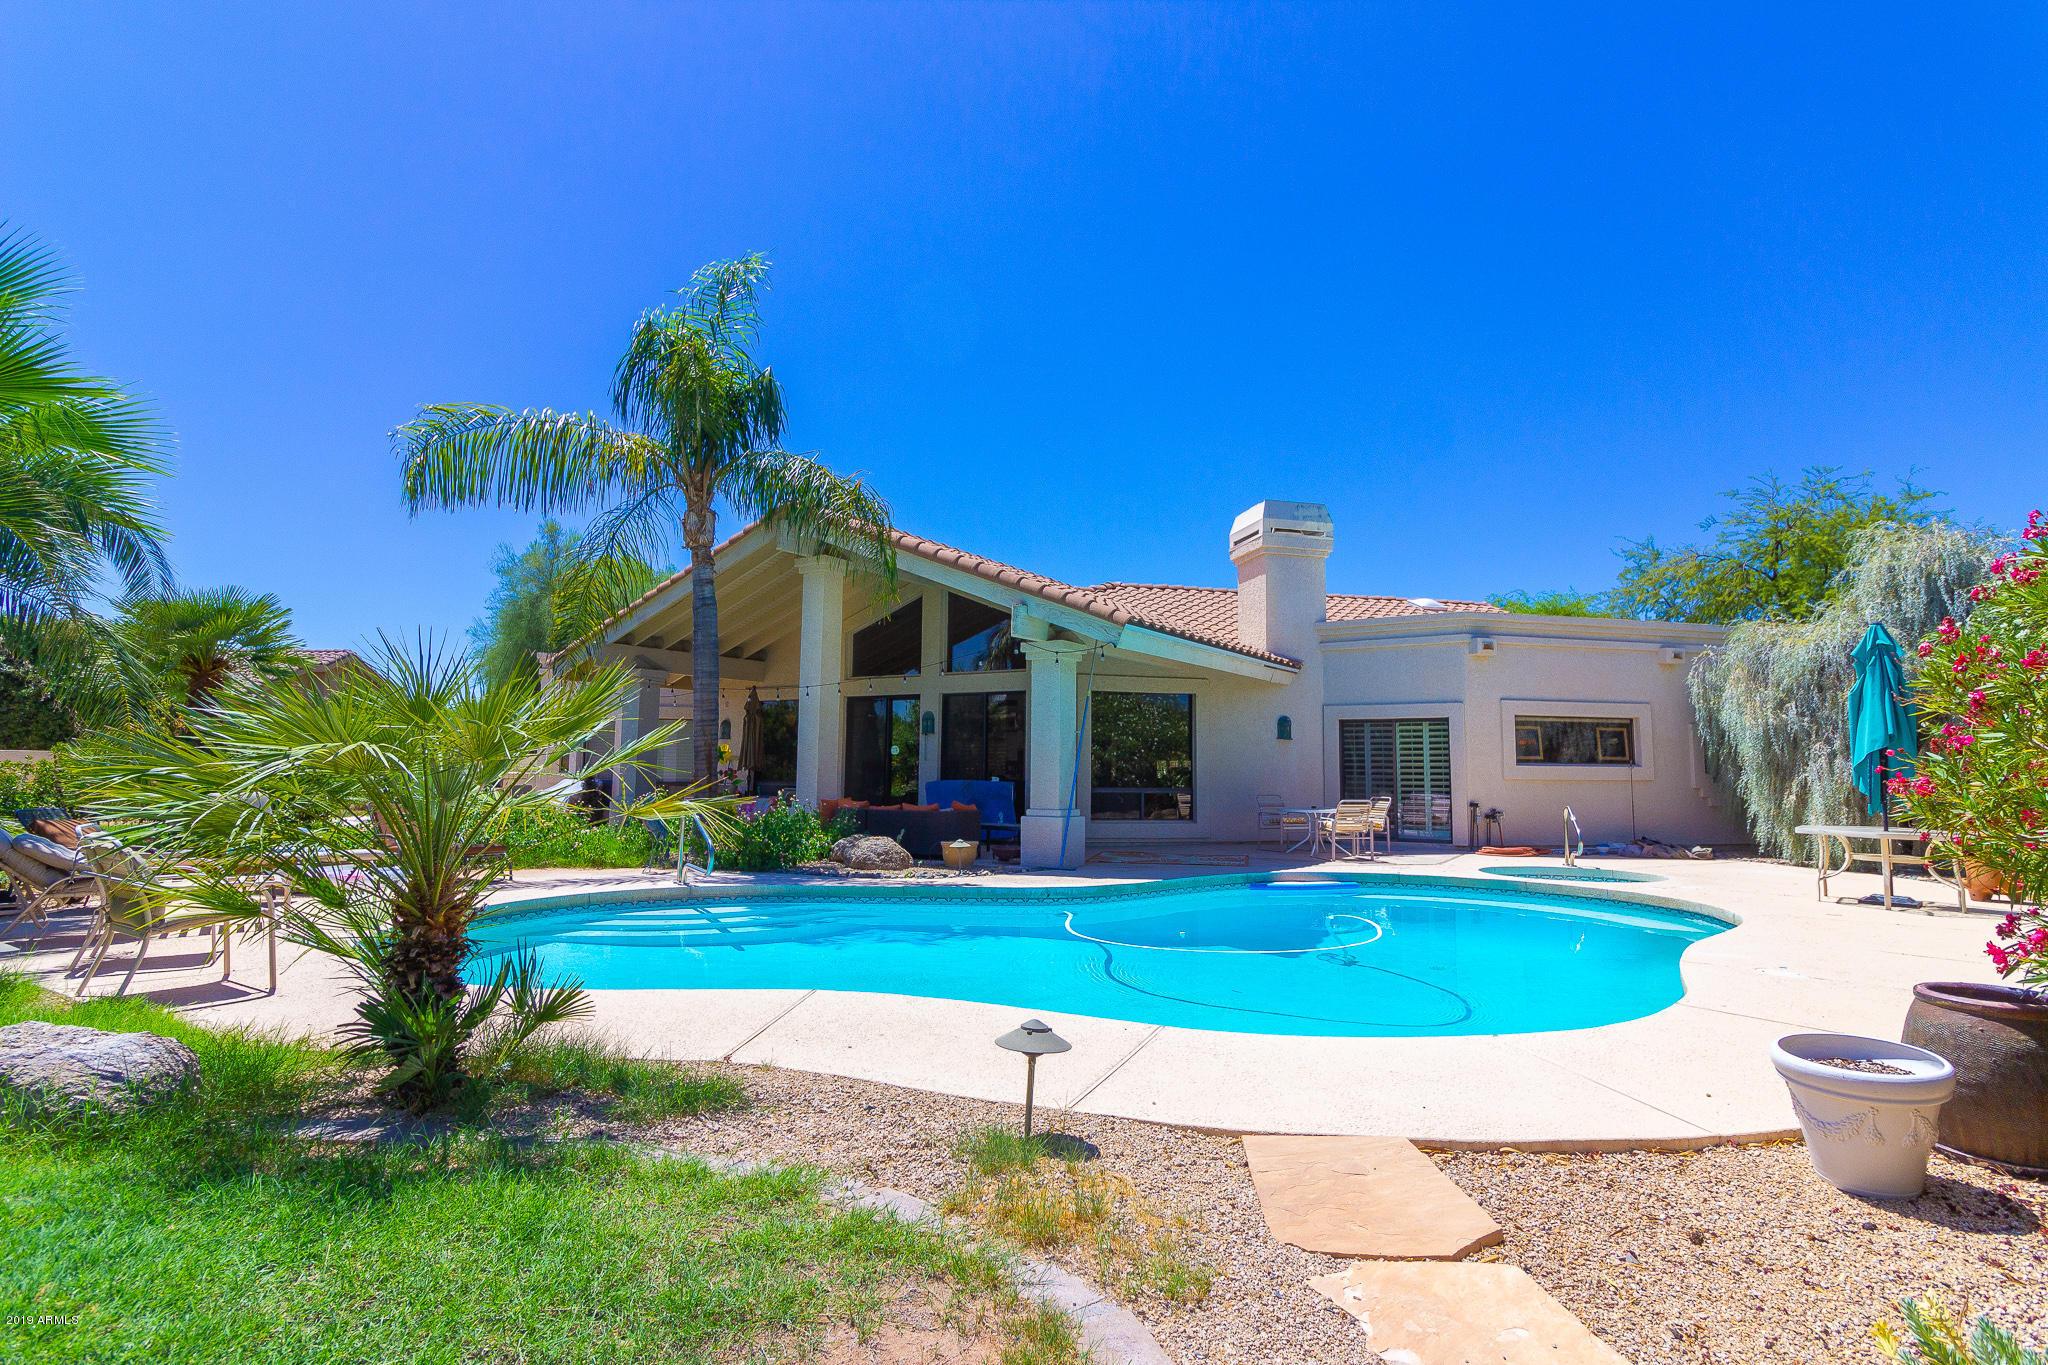 MLS 5969520 18942 E MOUNTAINAIRE Drive, Rio Verde, AZ 85263 Rio Verde AZ Adult Community